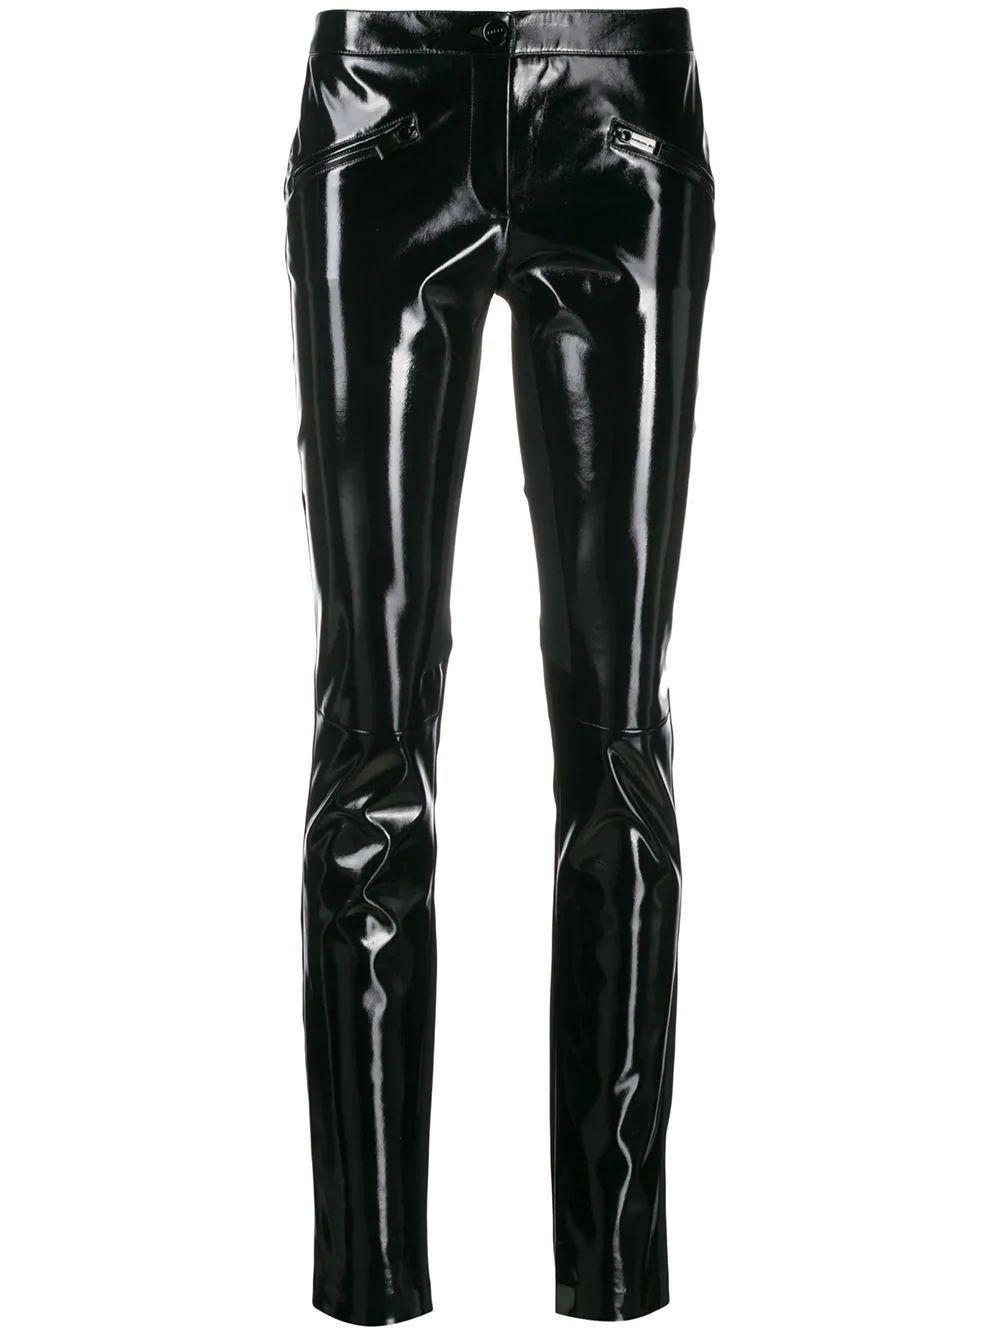 Patent Front Skinny Legging Pant